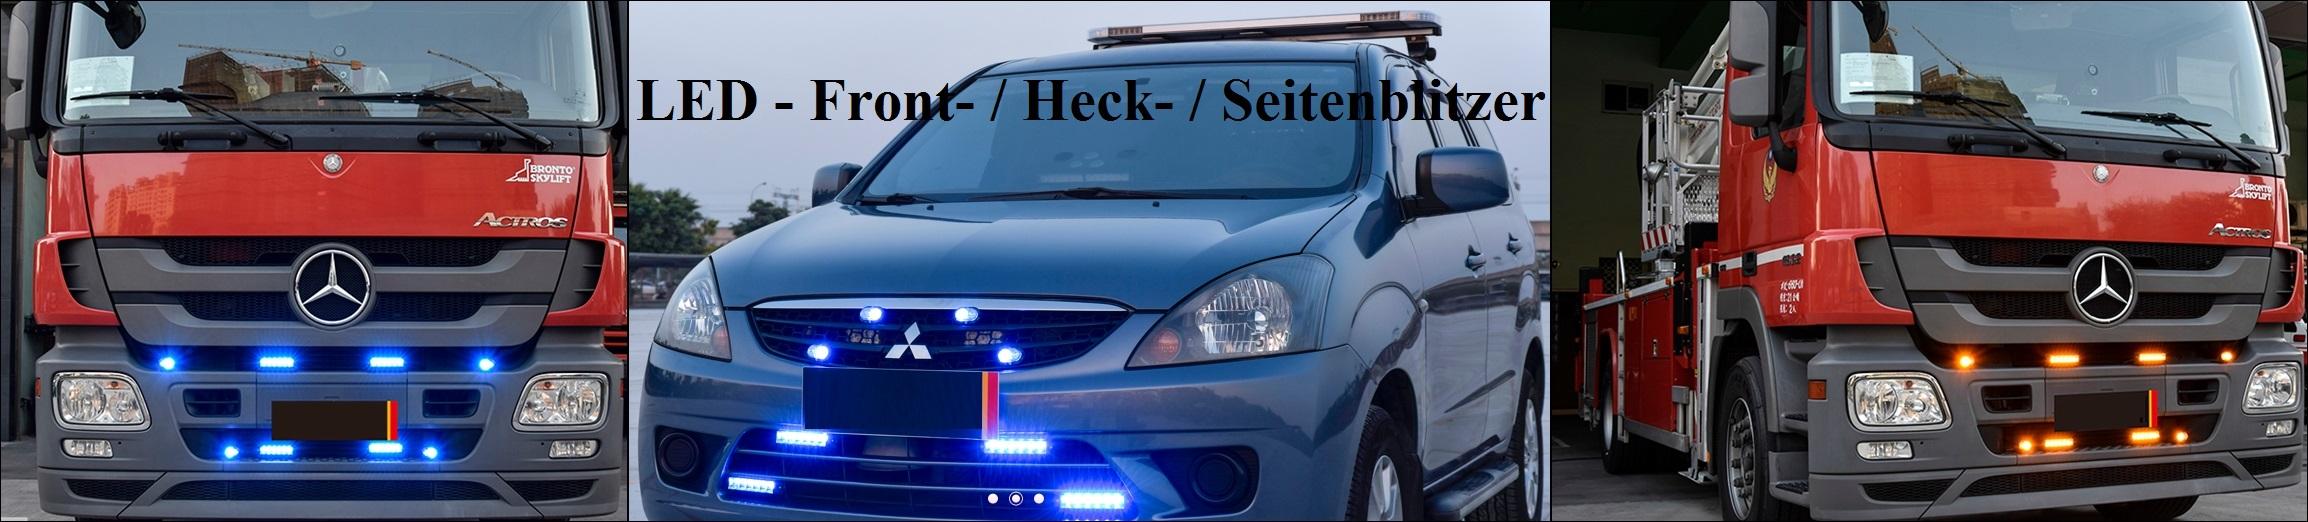 LED - Front- Heck- Seitenblitzer